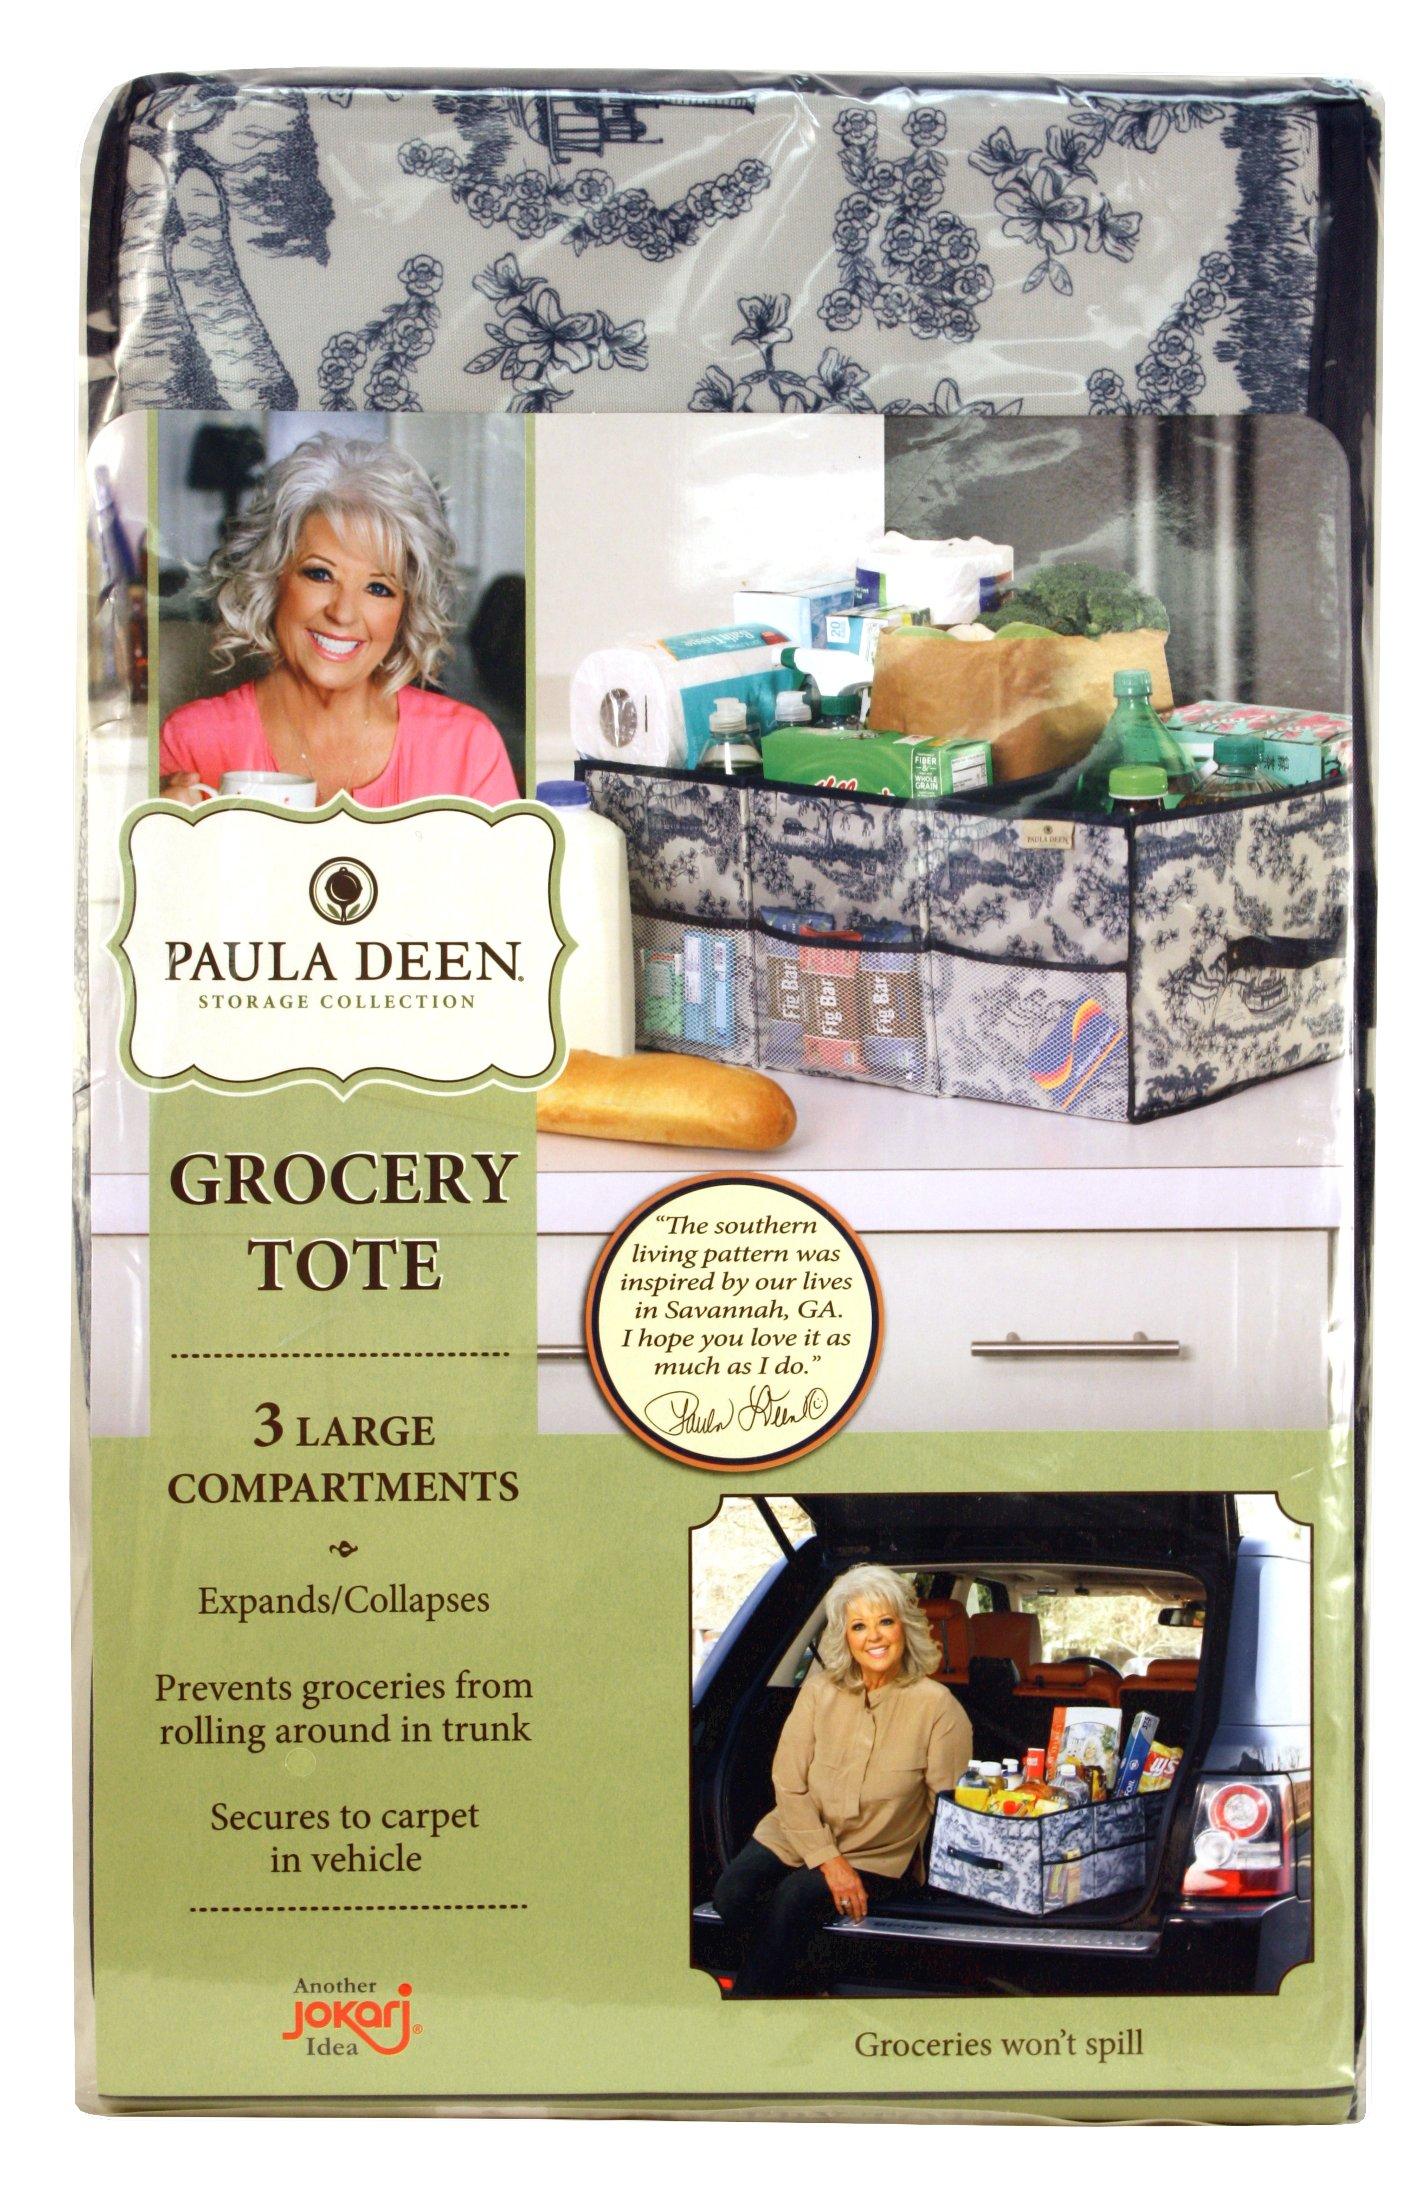 Paula Deen 20210 Jokari Everyday Grocery Tote & Car Trunk Organizer by Paula Deen (Image #3)